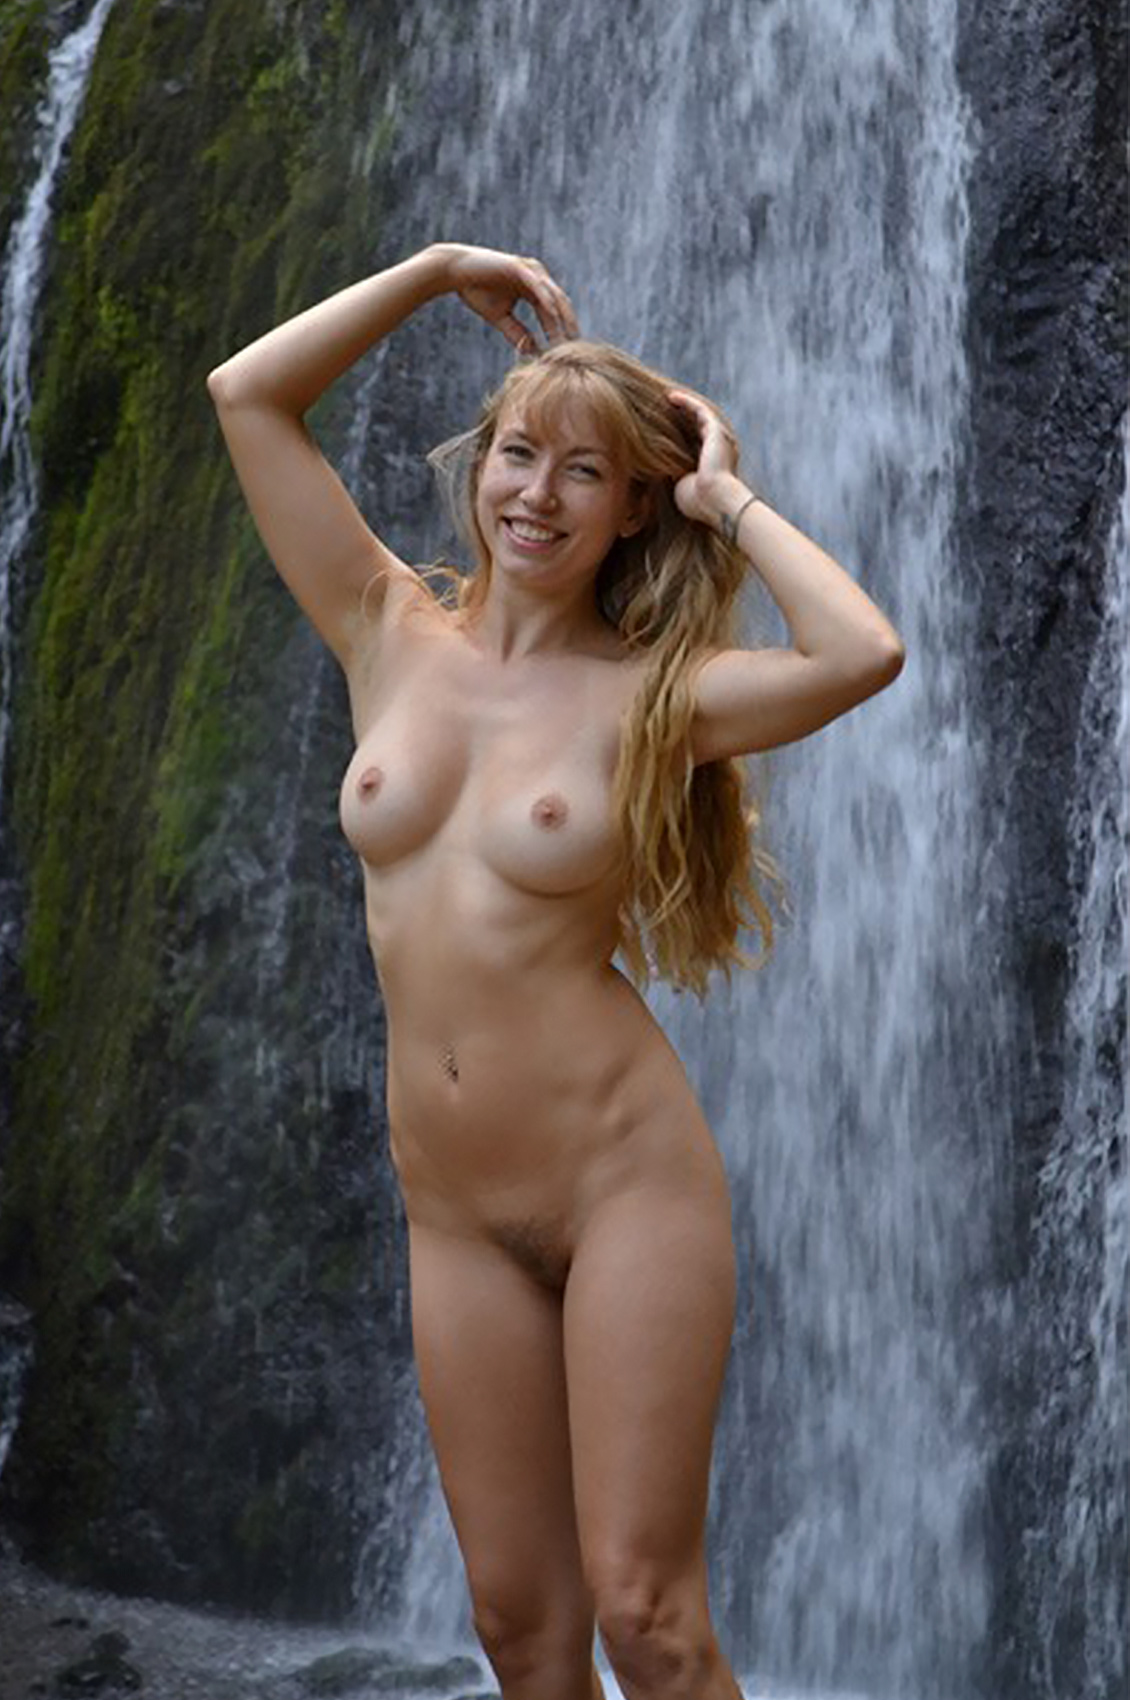 Verronica Kirei's VR Porn Videos, Bio & Free Nude Pics